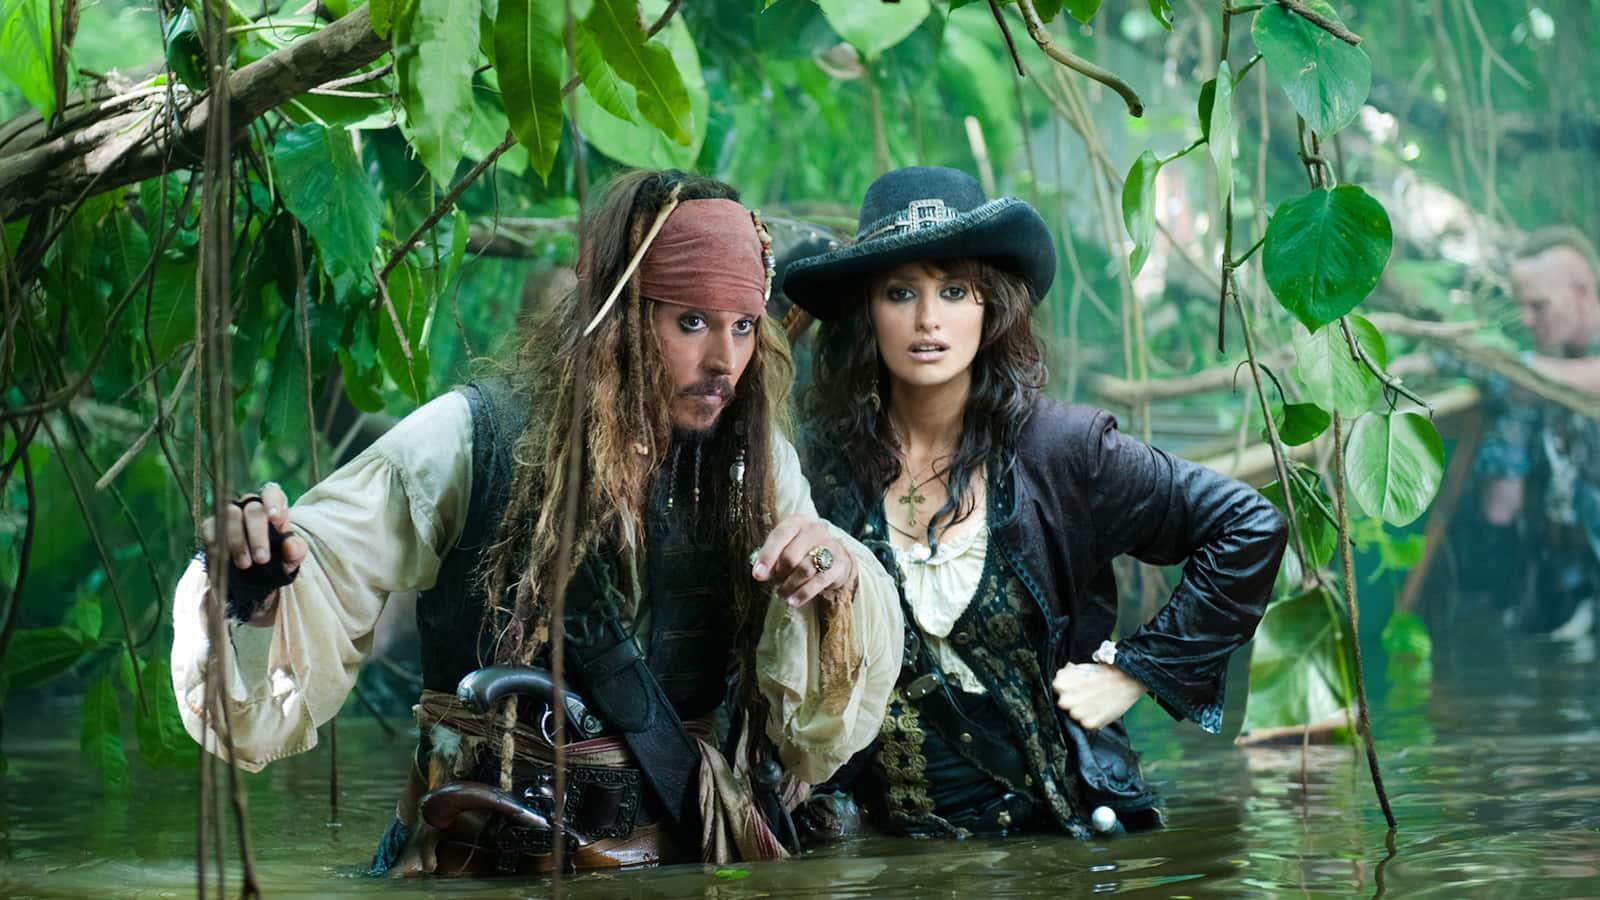 pirates-of-the-caribbean-i-frammande-farvatten-2011